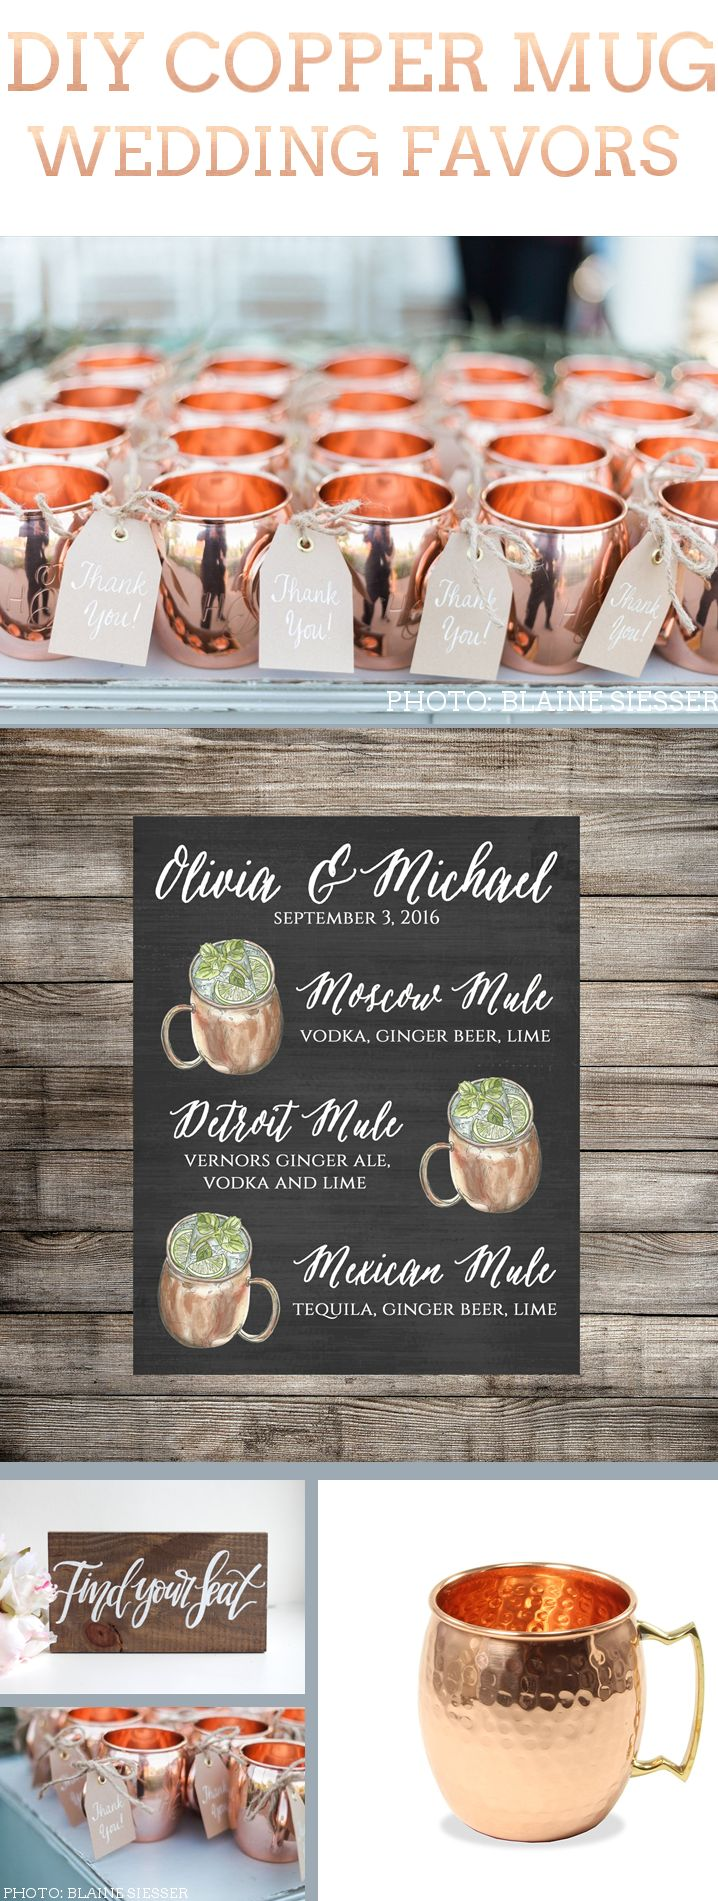 Coffee mug wedding favors - Diy Copper Mug Wedding Favors Emma Line Bride